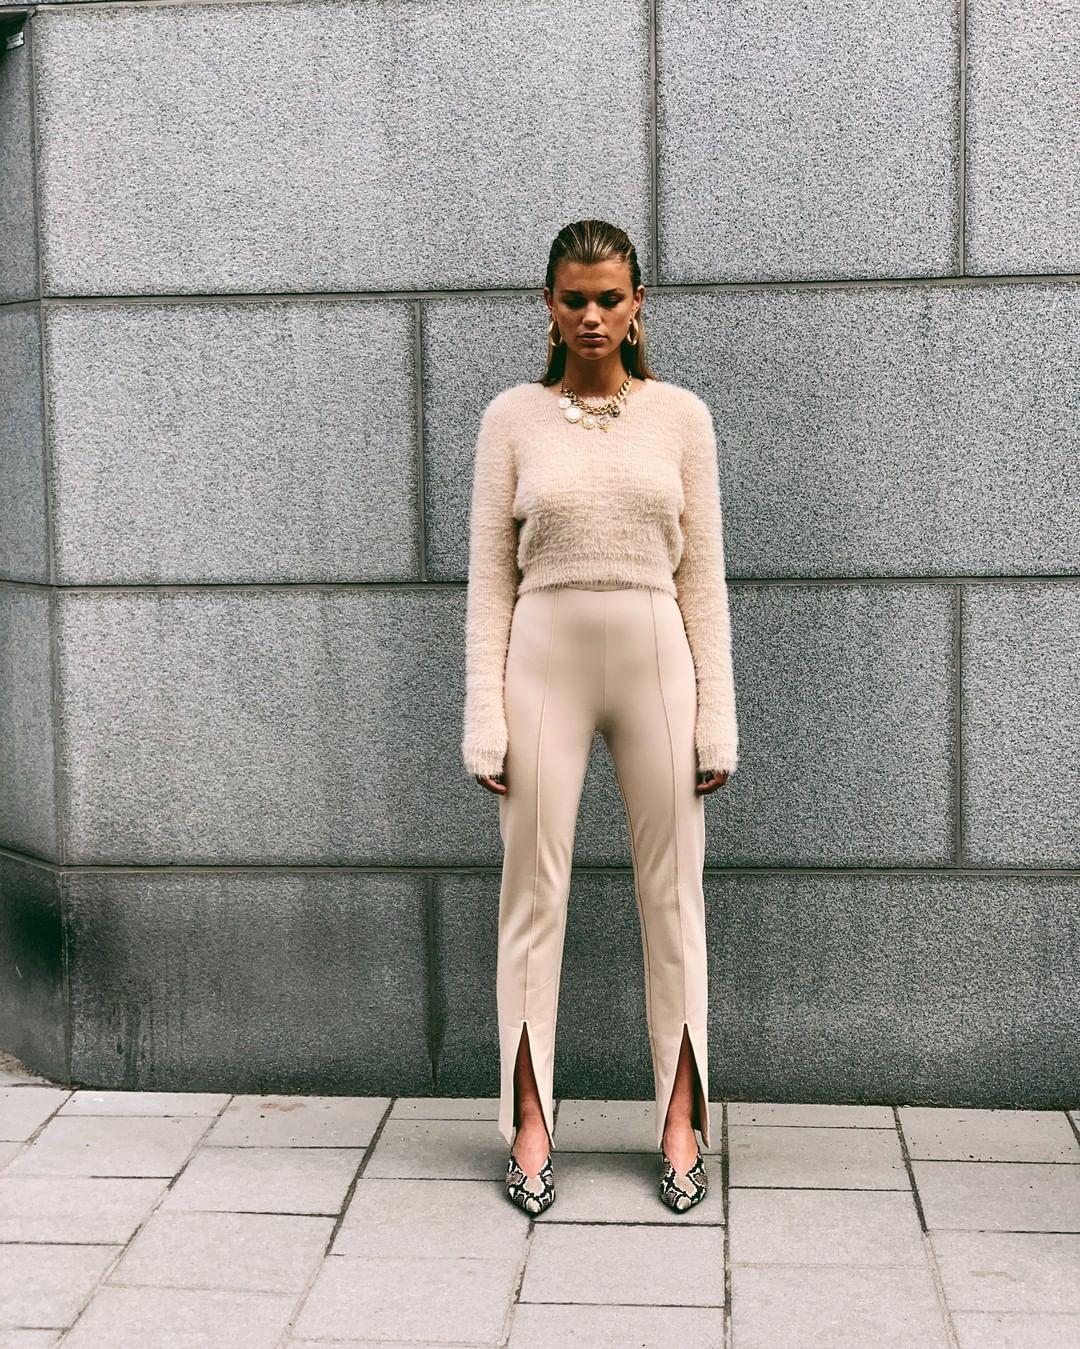 ТРЕНД РАДАР: Панталони с цепка и нови правила в модната игра